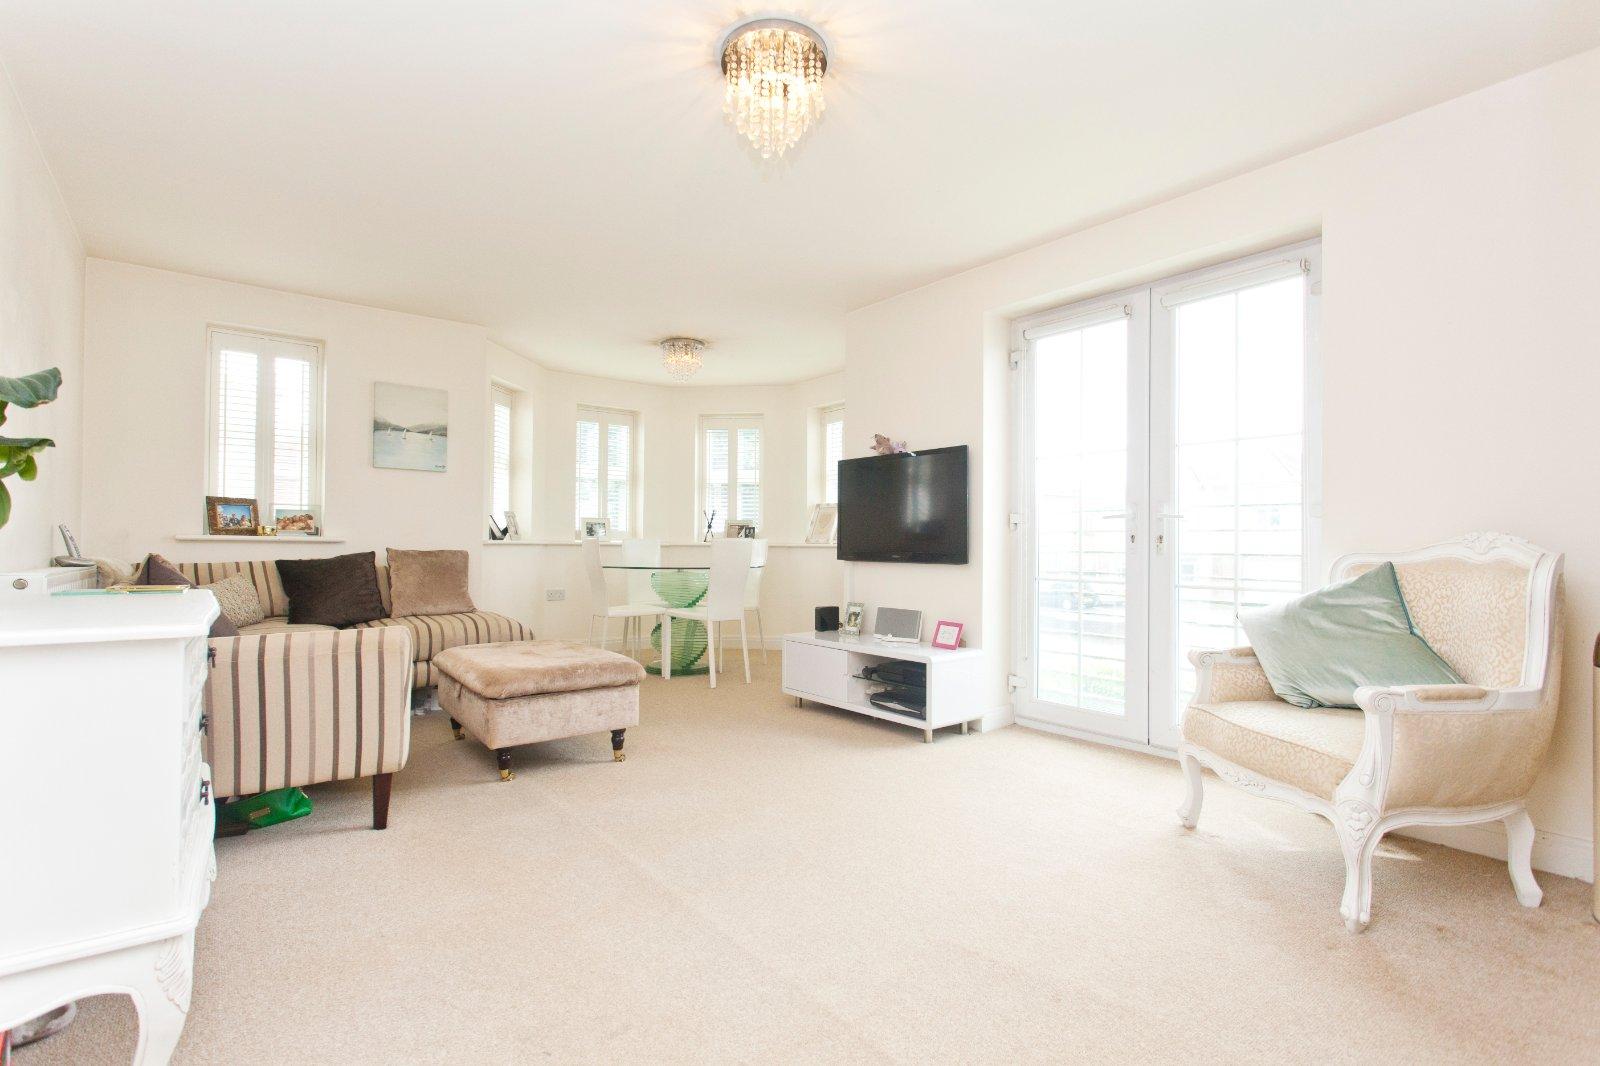 2 bed apartment for sale in Sanshore Court, 16 Glenair Avenue, BH14